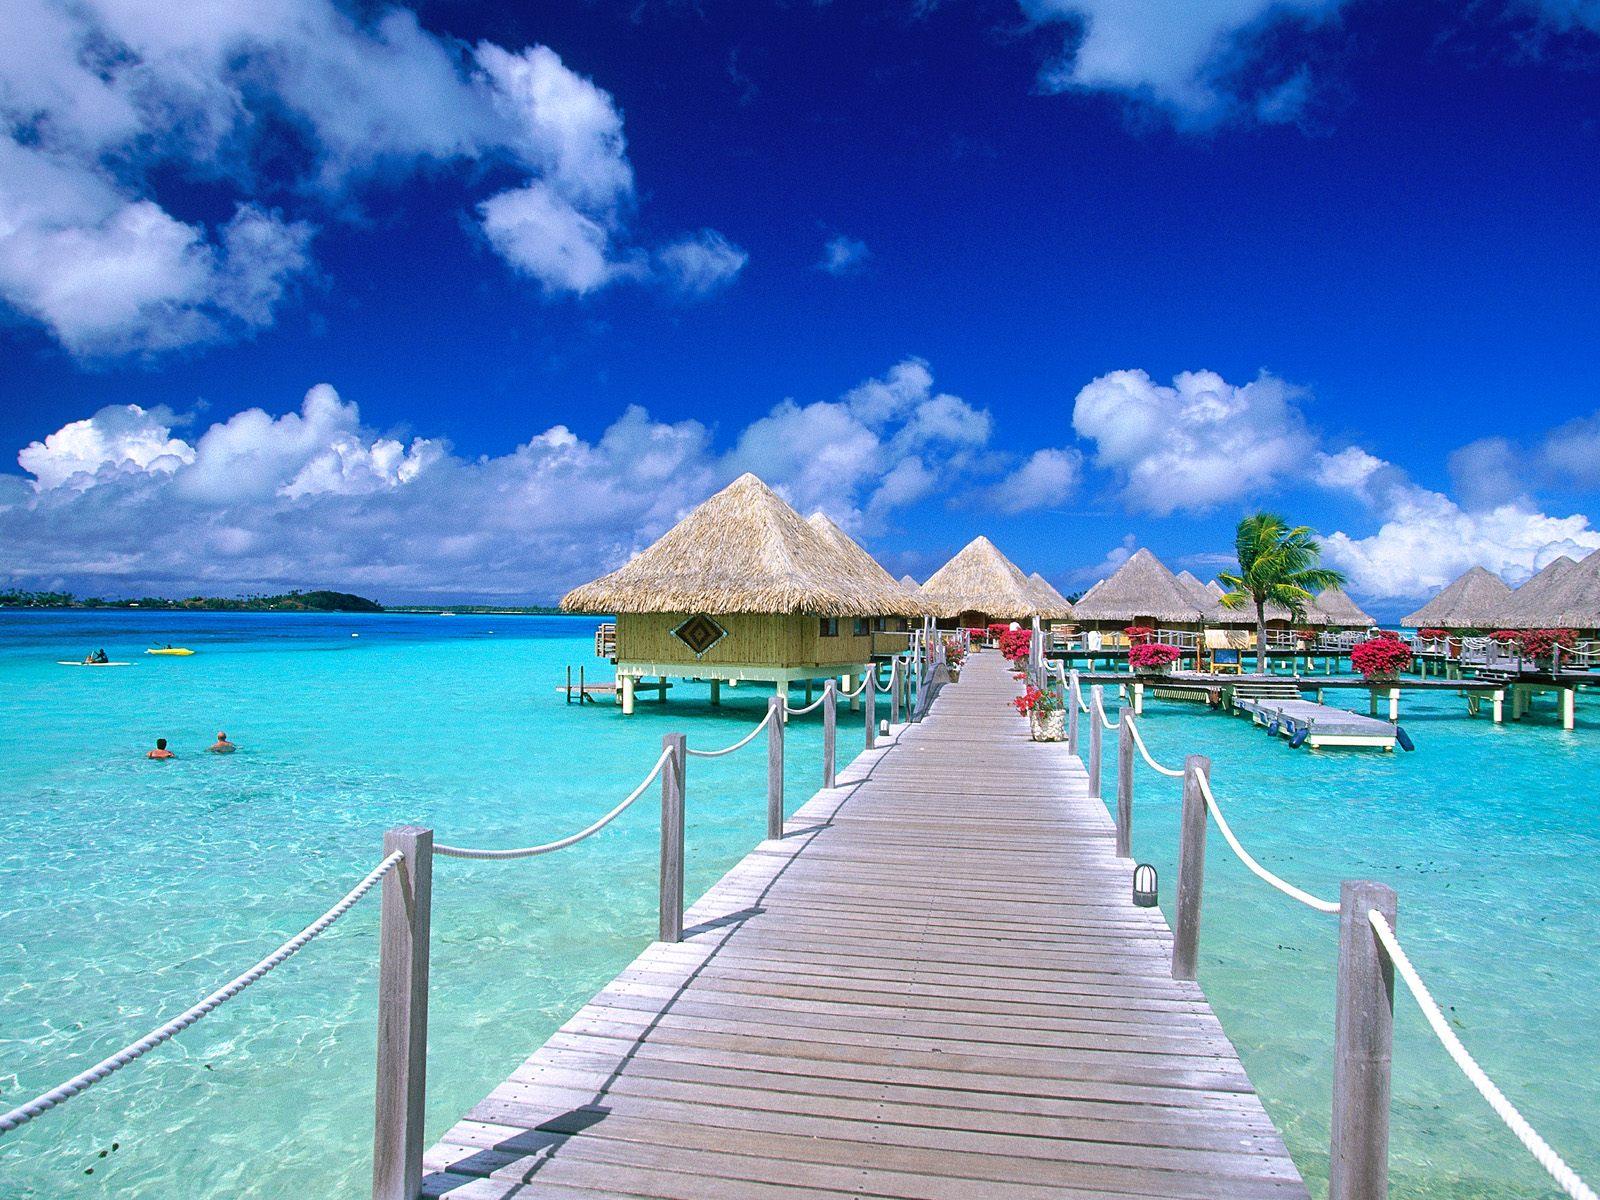 1600x1200 tropical island beach scenery holiday village wallpaper 1600x1200